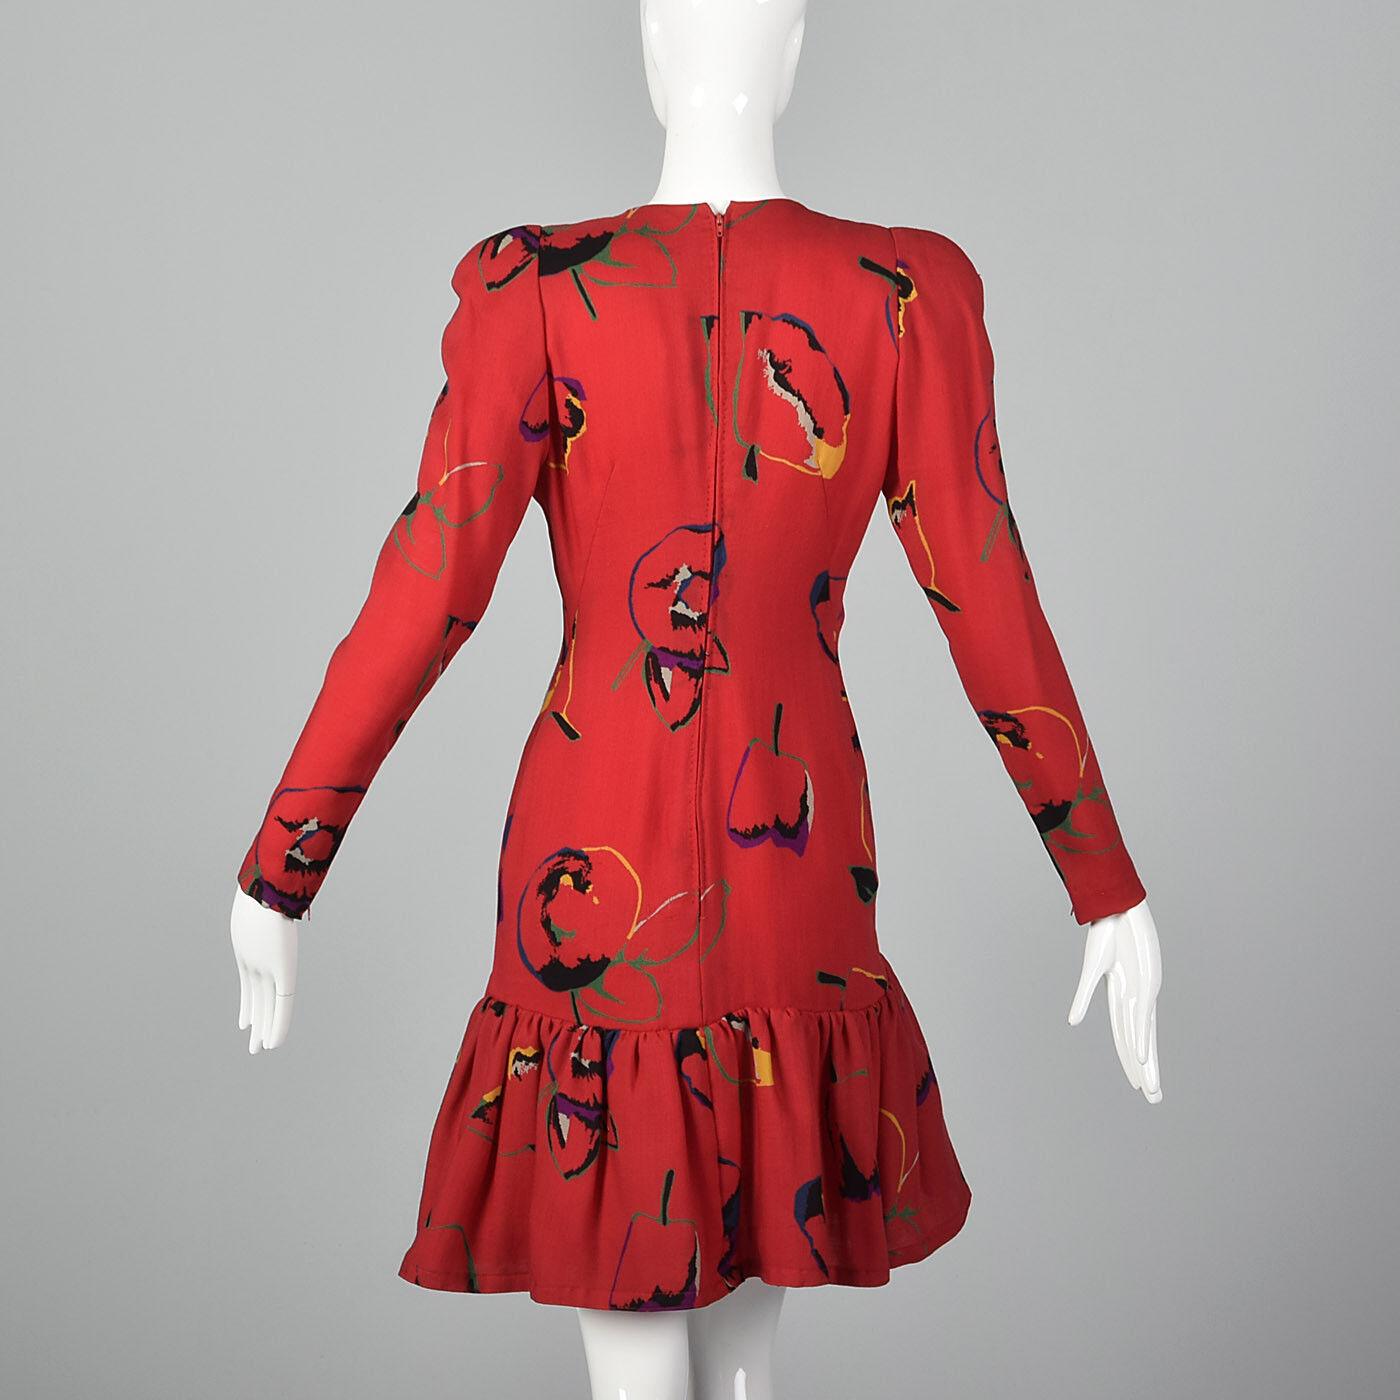 S 1980s Pauline Trigere Long Sleeve Red Dress Dro… - image 2